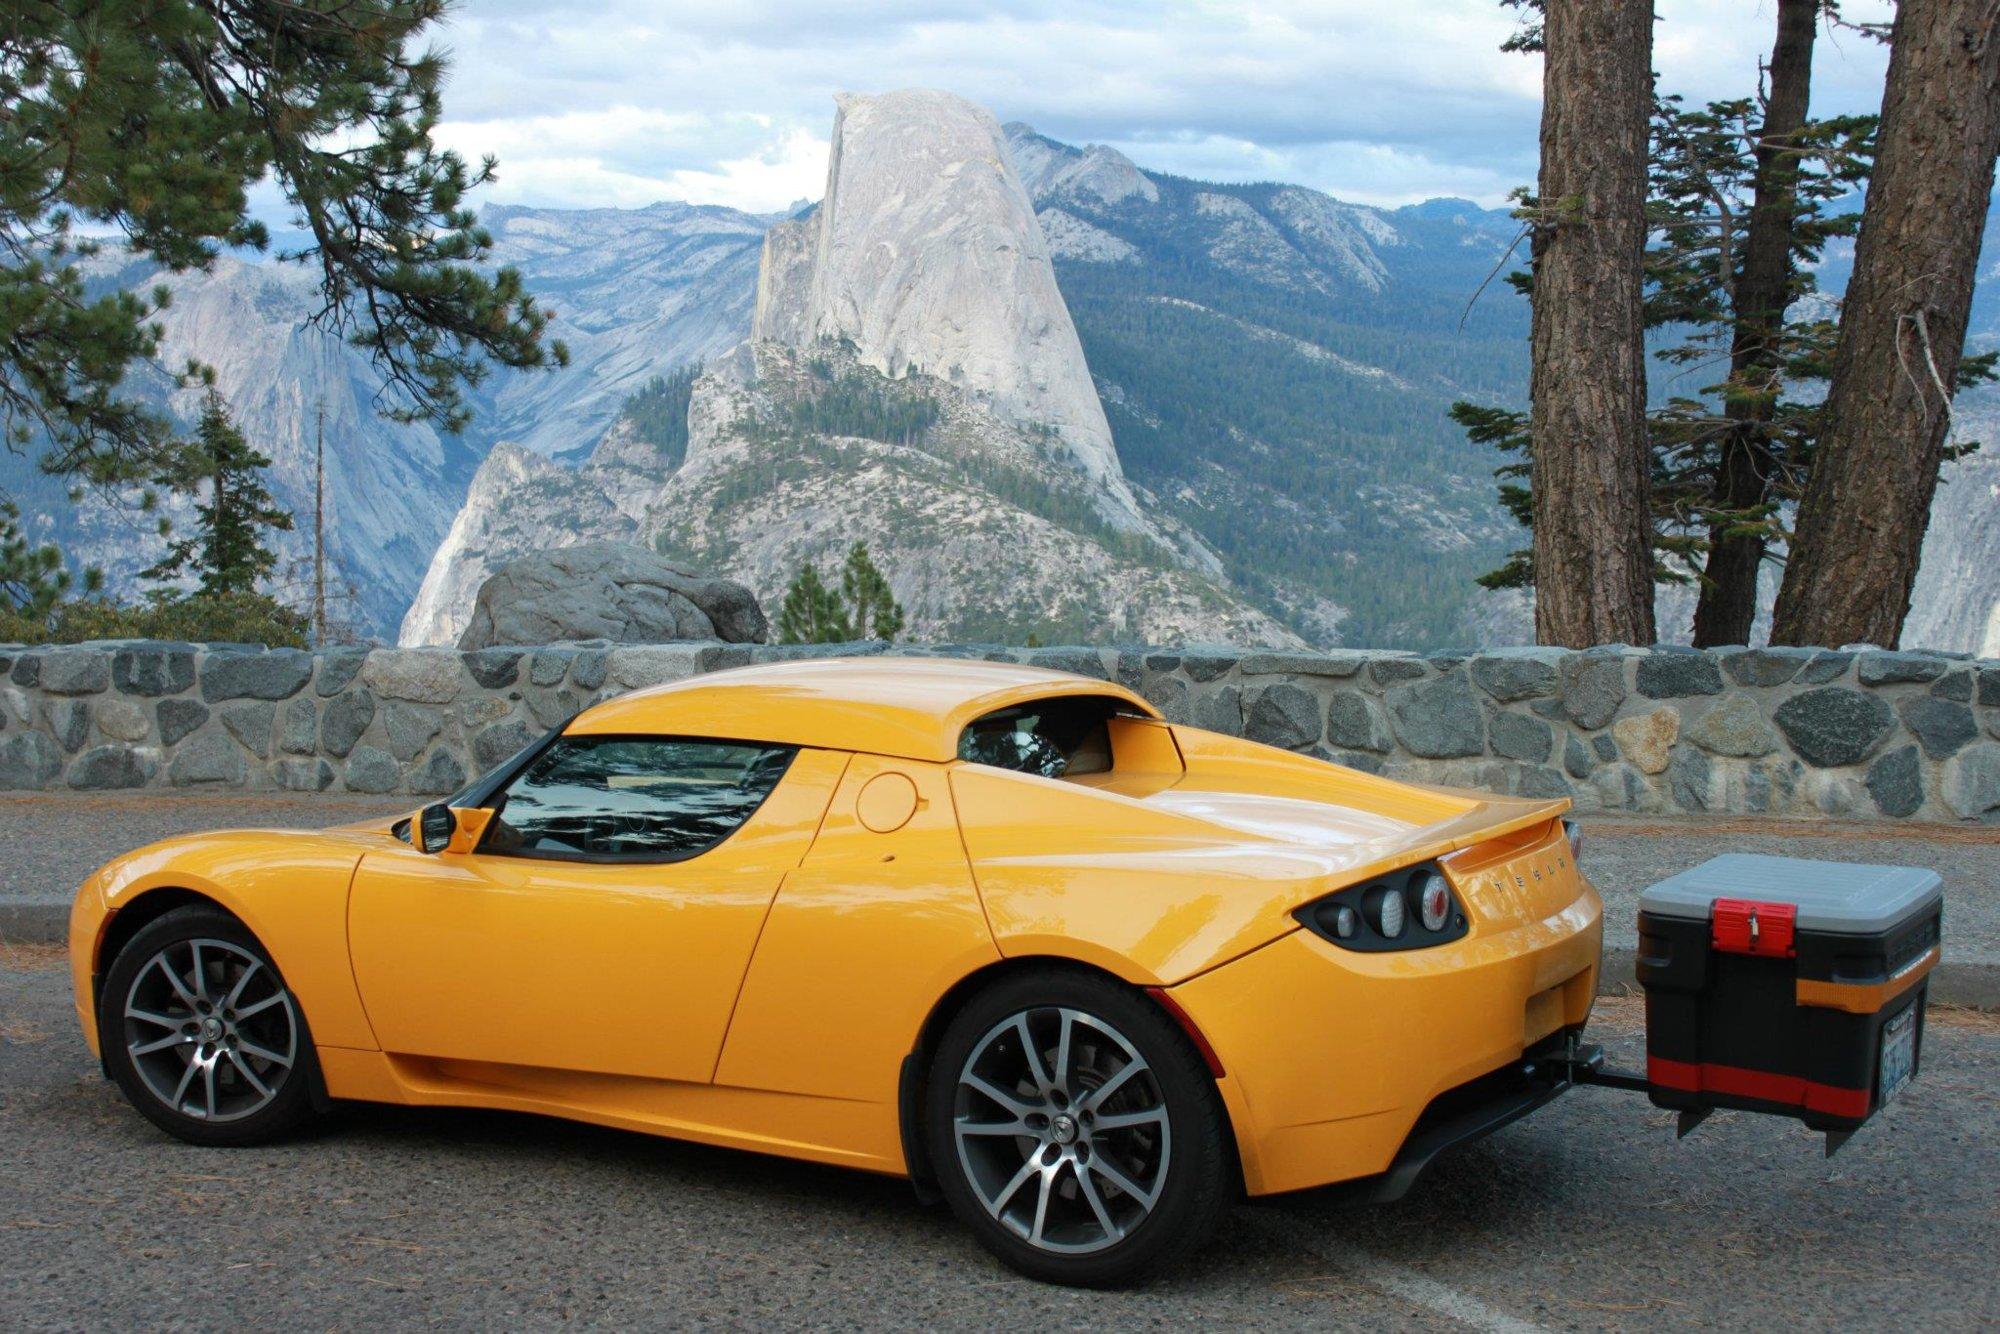 RoadsterAtYosemite.jpg